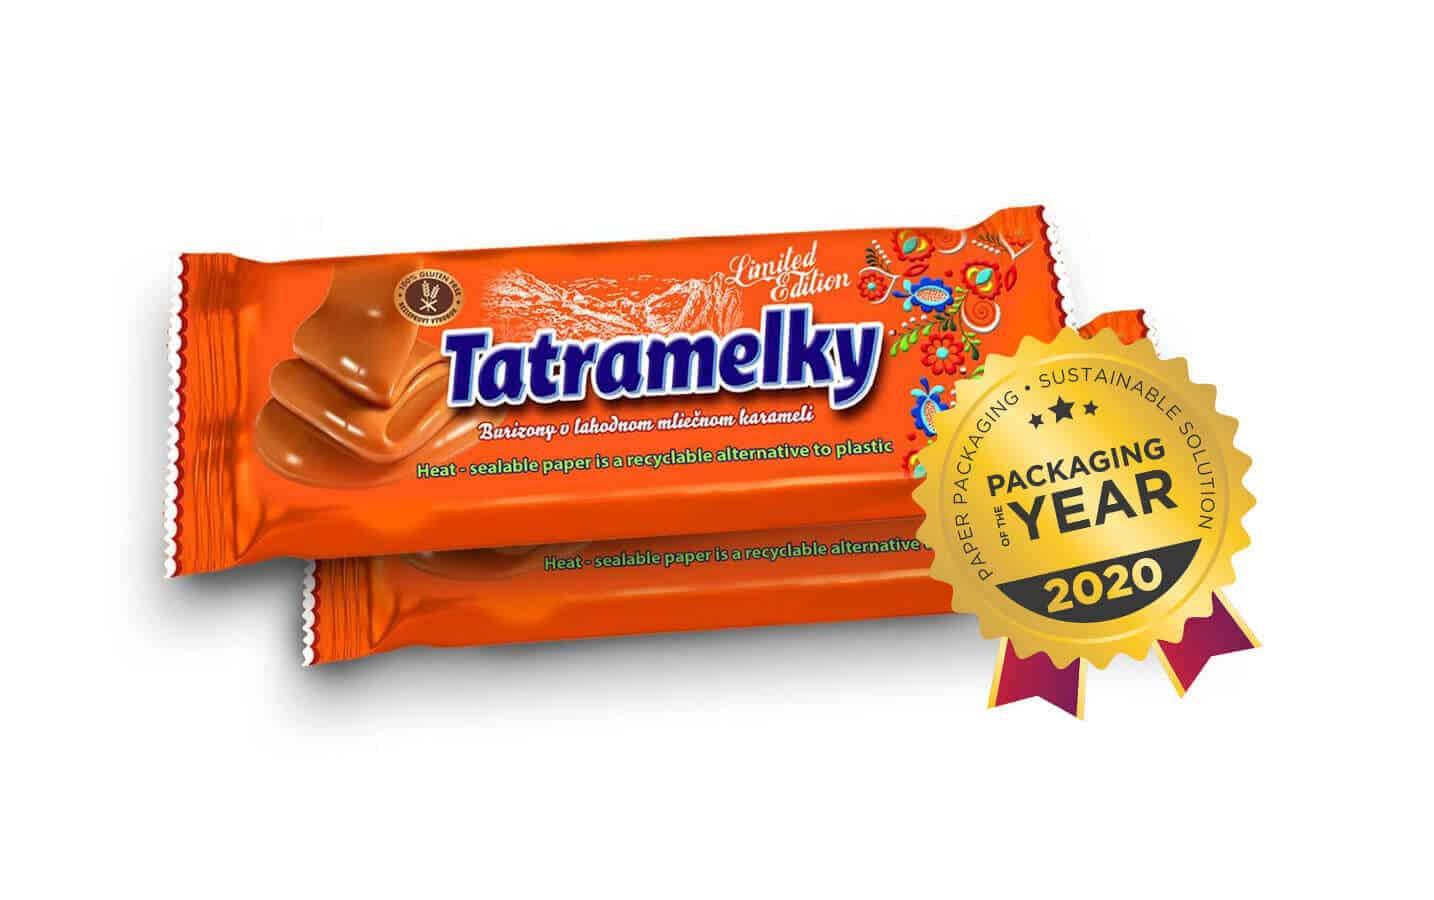 Packaging of the year - Tatramelky